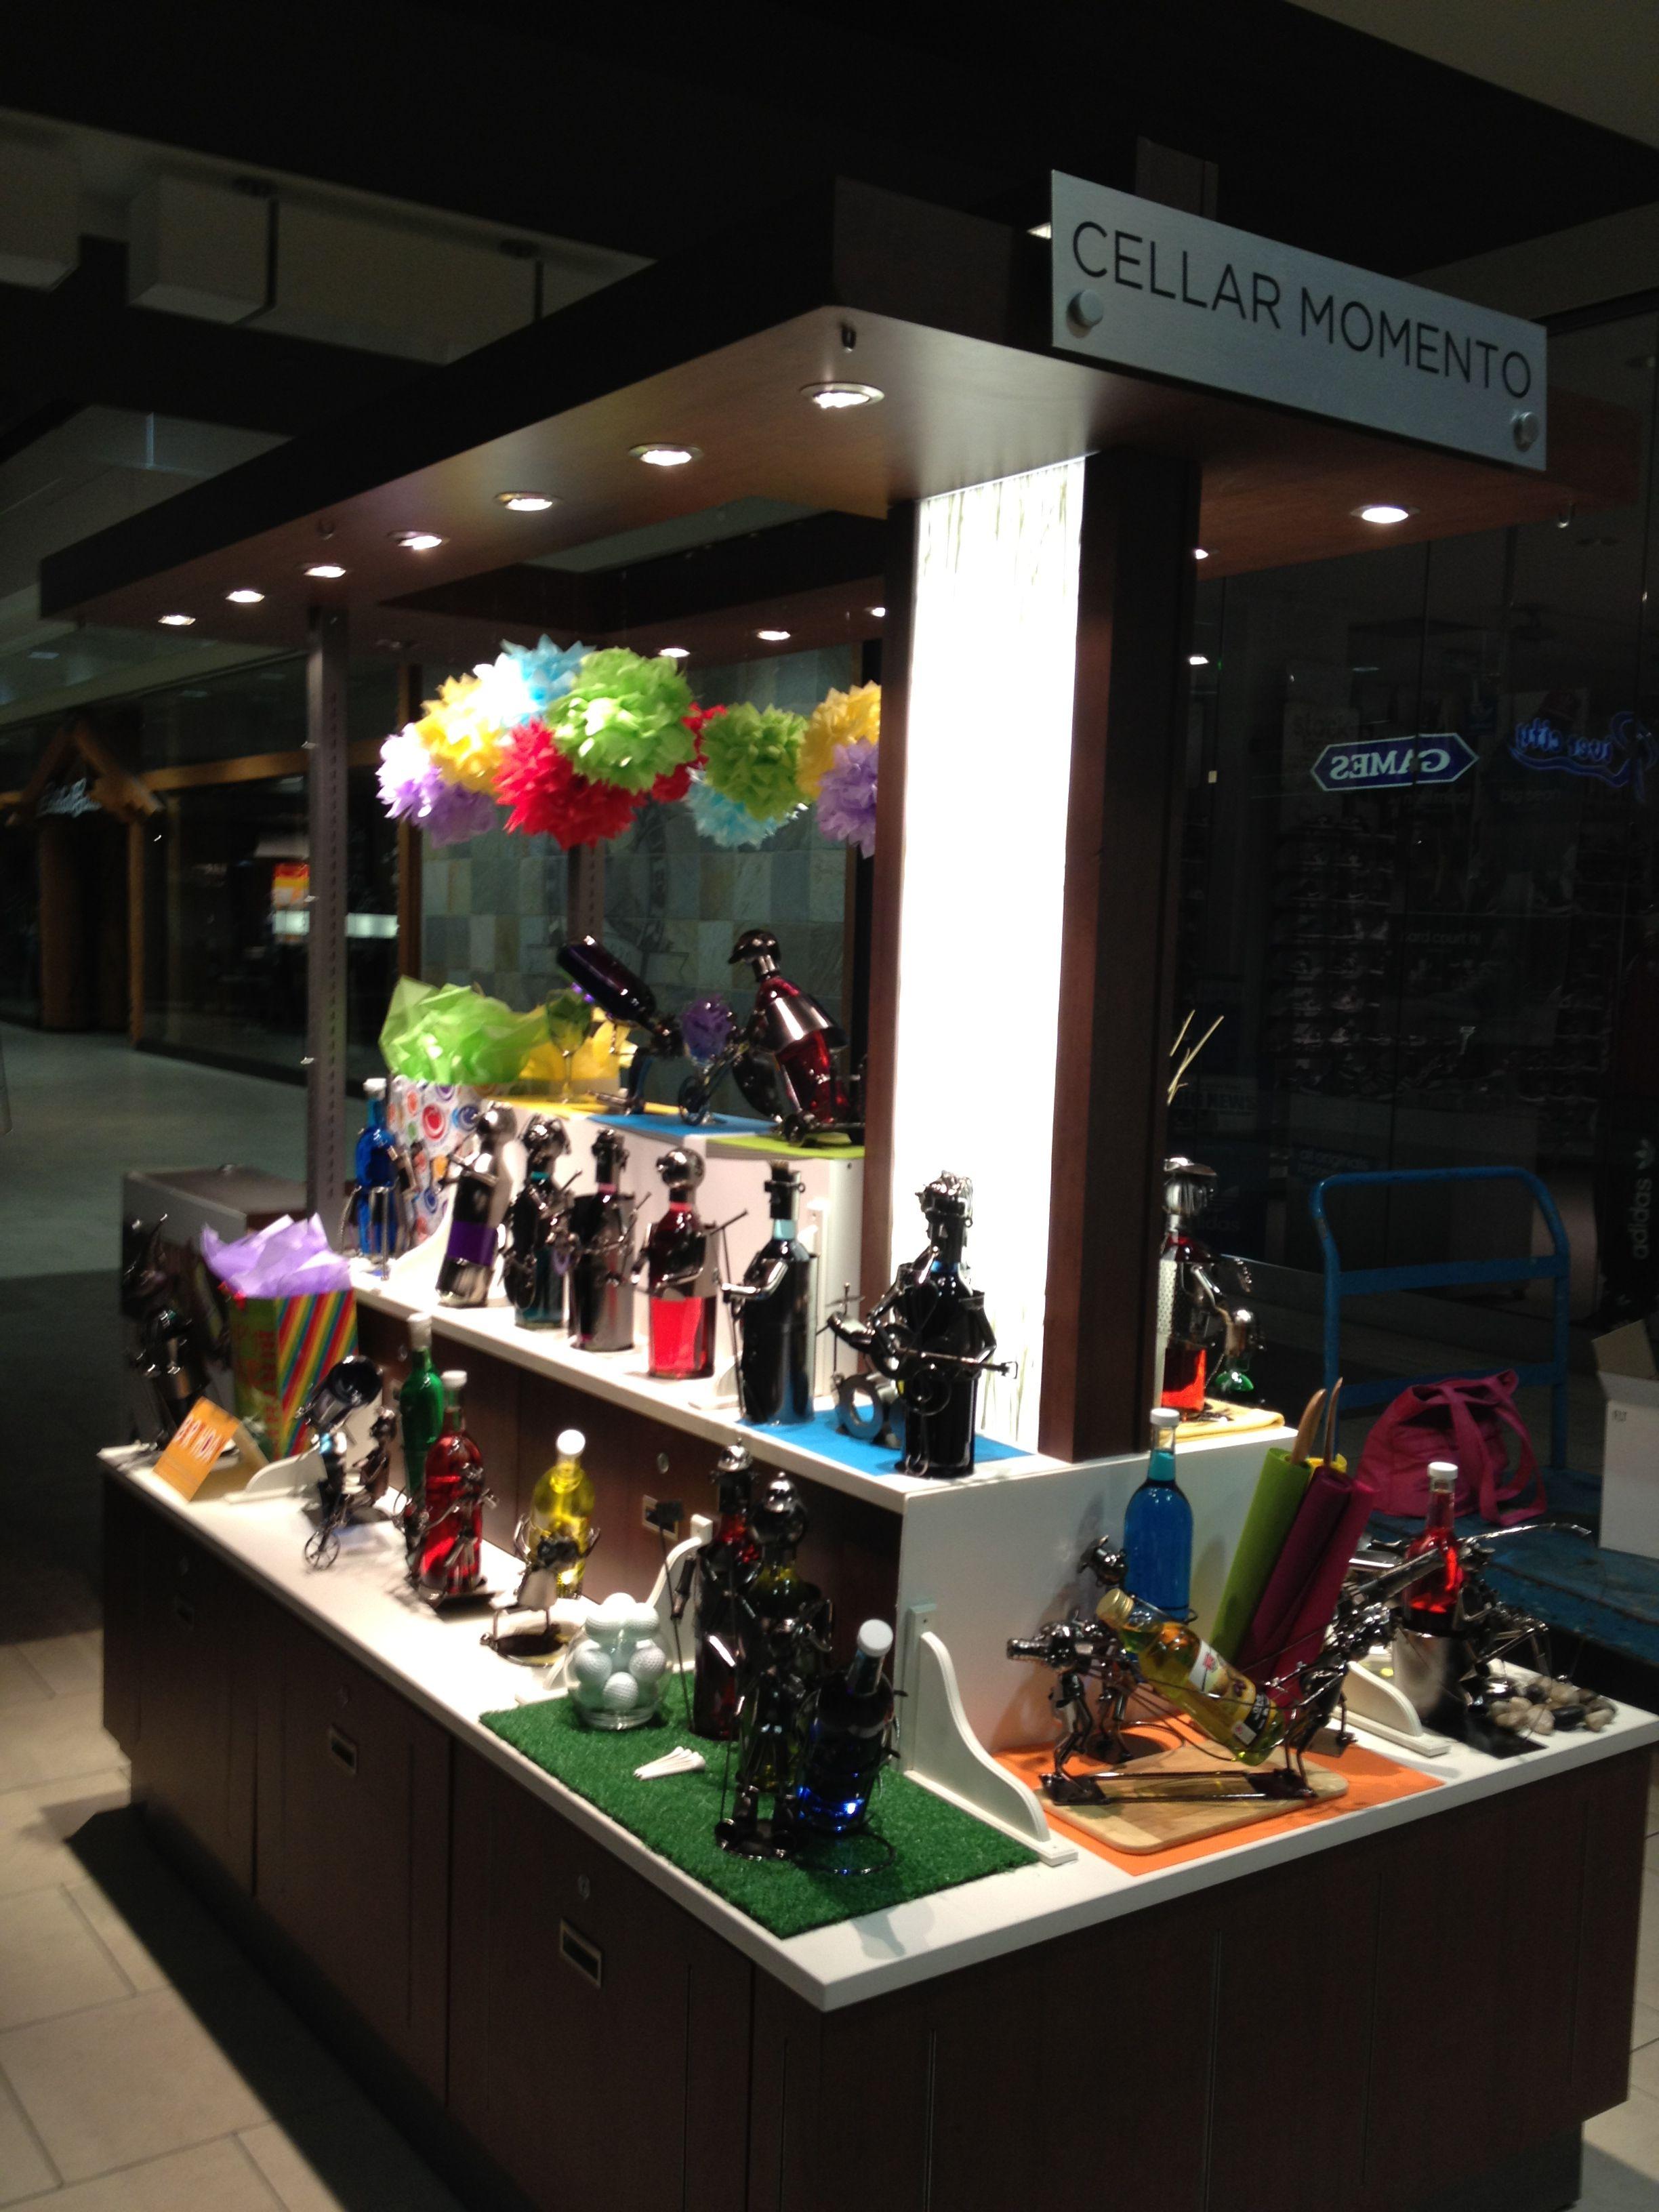 Cellar Momento Cart By Flourish Design & Merchandising Visual Merchandising,